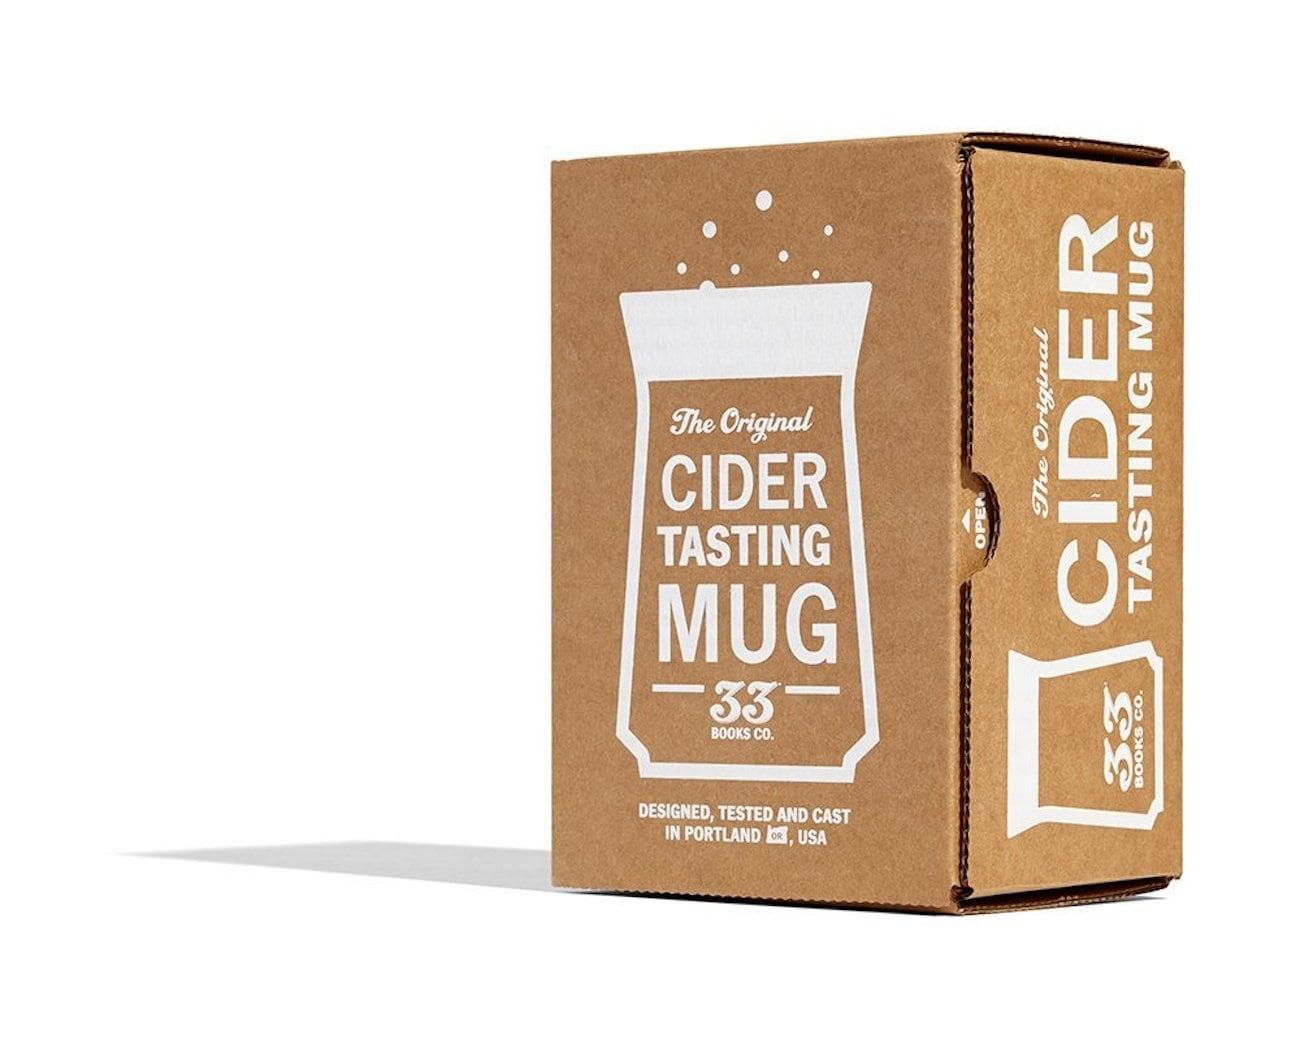 33 Books Original Cider-Tasting Mug